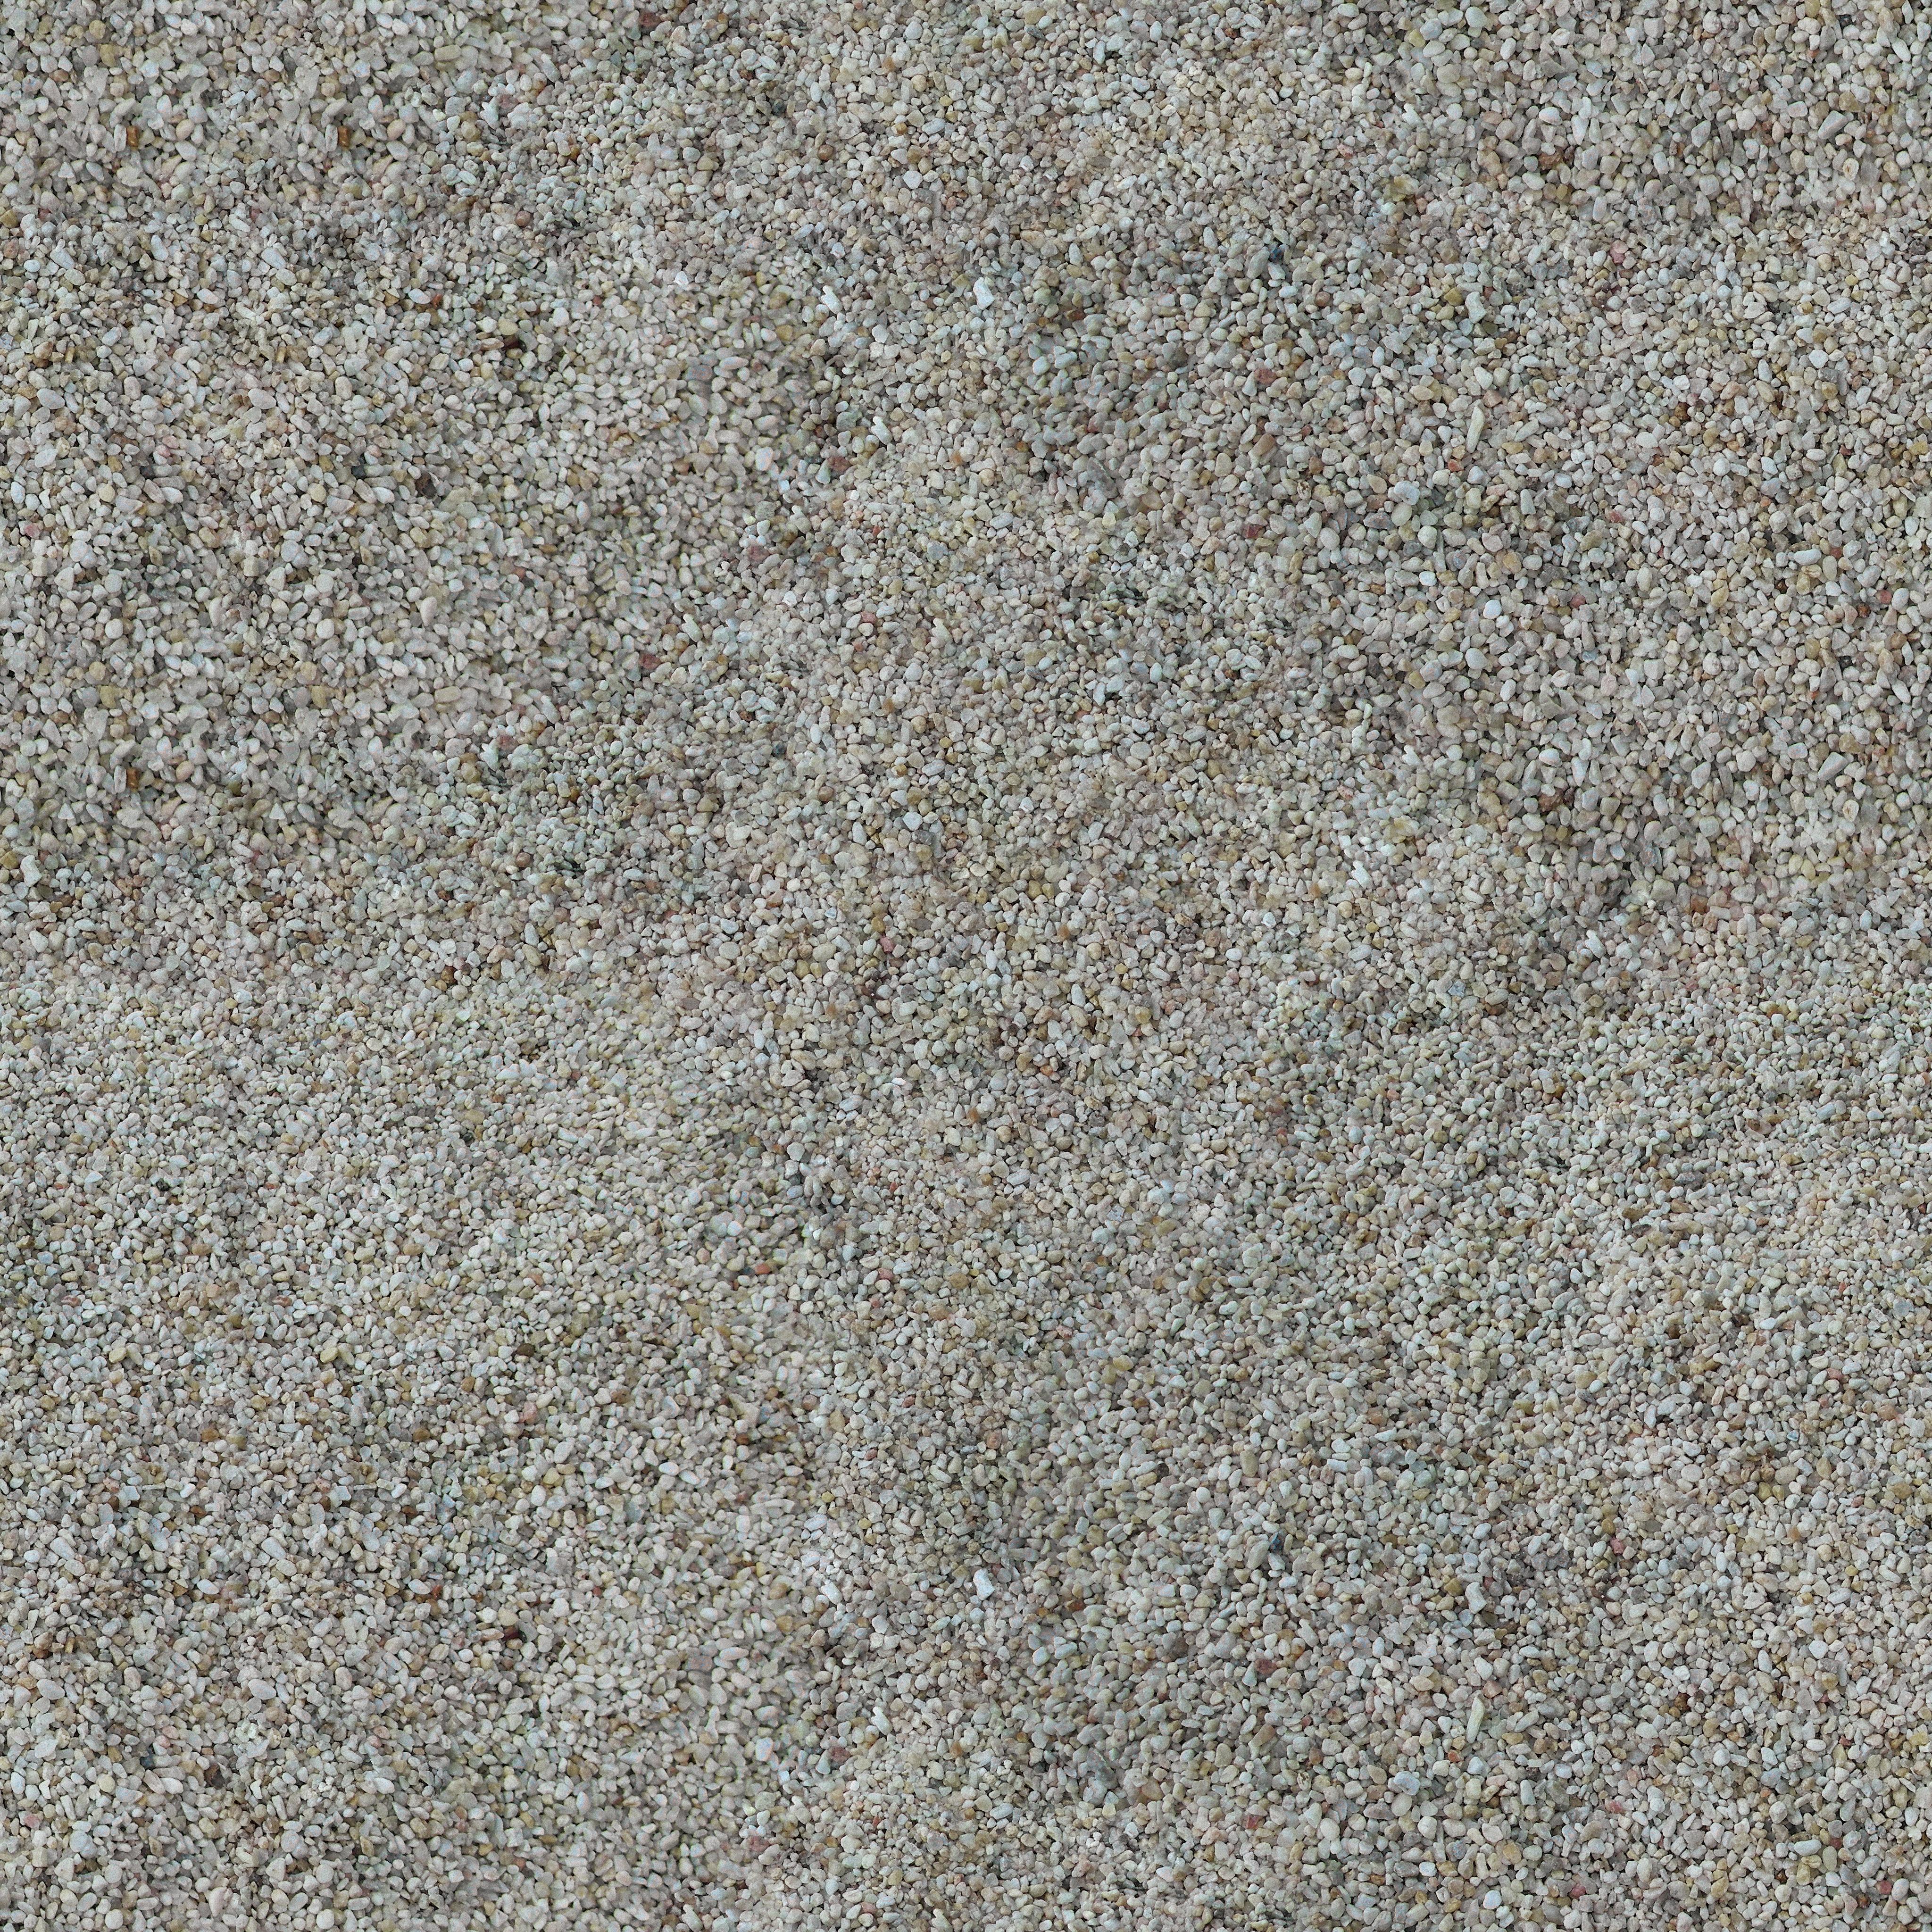 Texture Gravel 4k By Reconditearcana On Deviantart